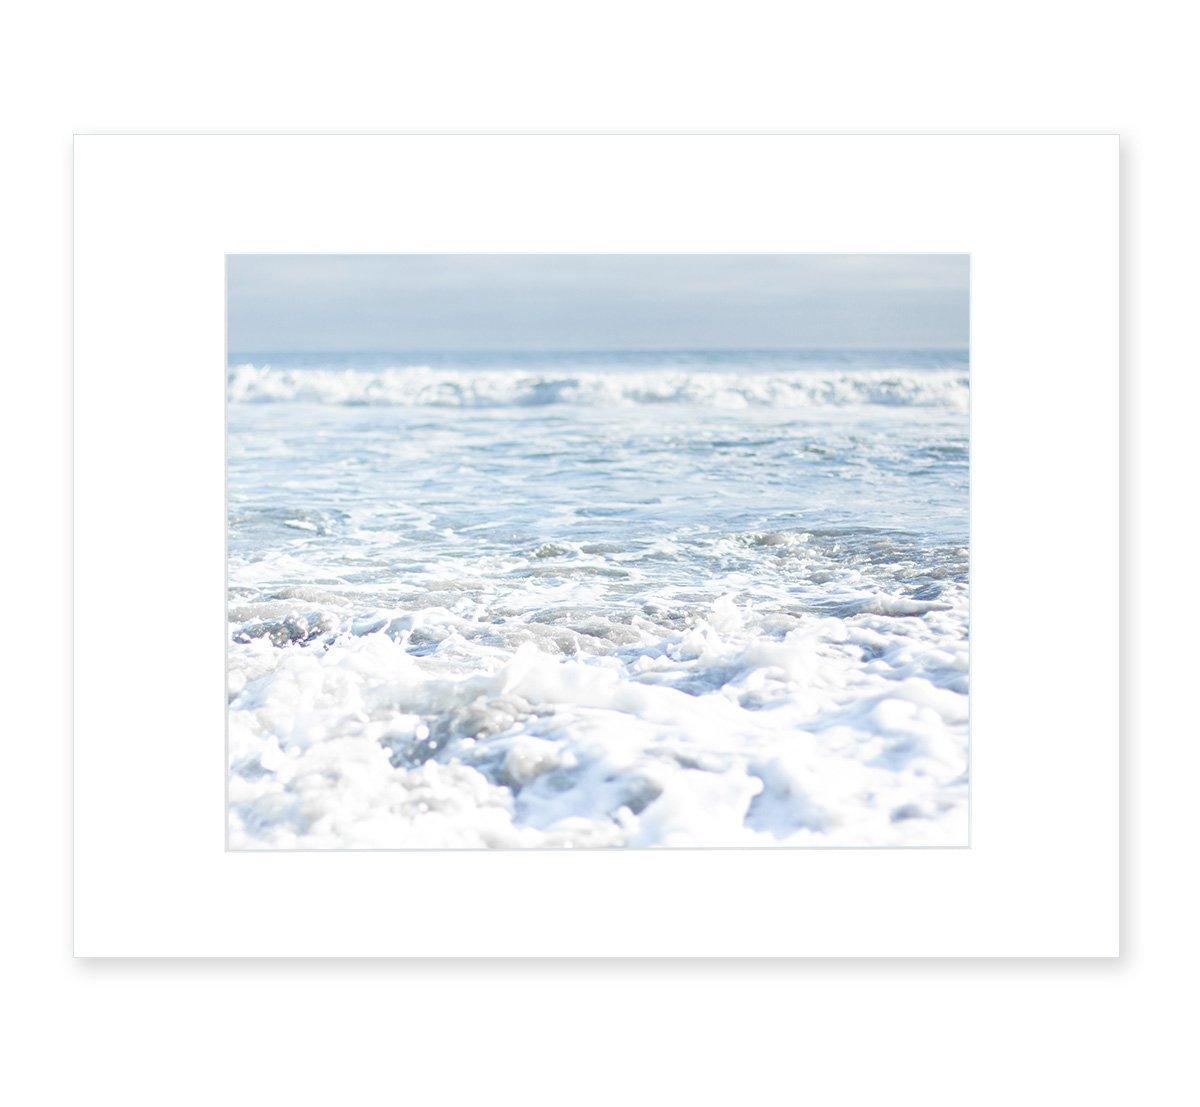 Blue Beach Art, Ocean Waves Coastal Decor, Seascape Wall Art, California Beach House Pictures, 8x10 Matted Photographic Print (fits 11x14 frame), Fresh Surf'